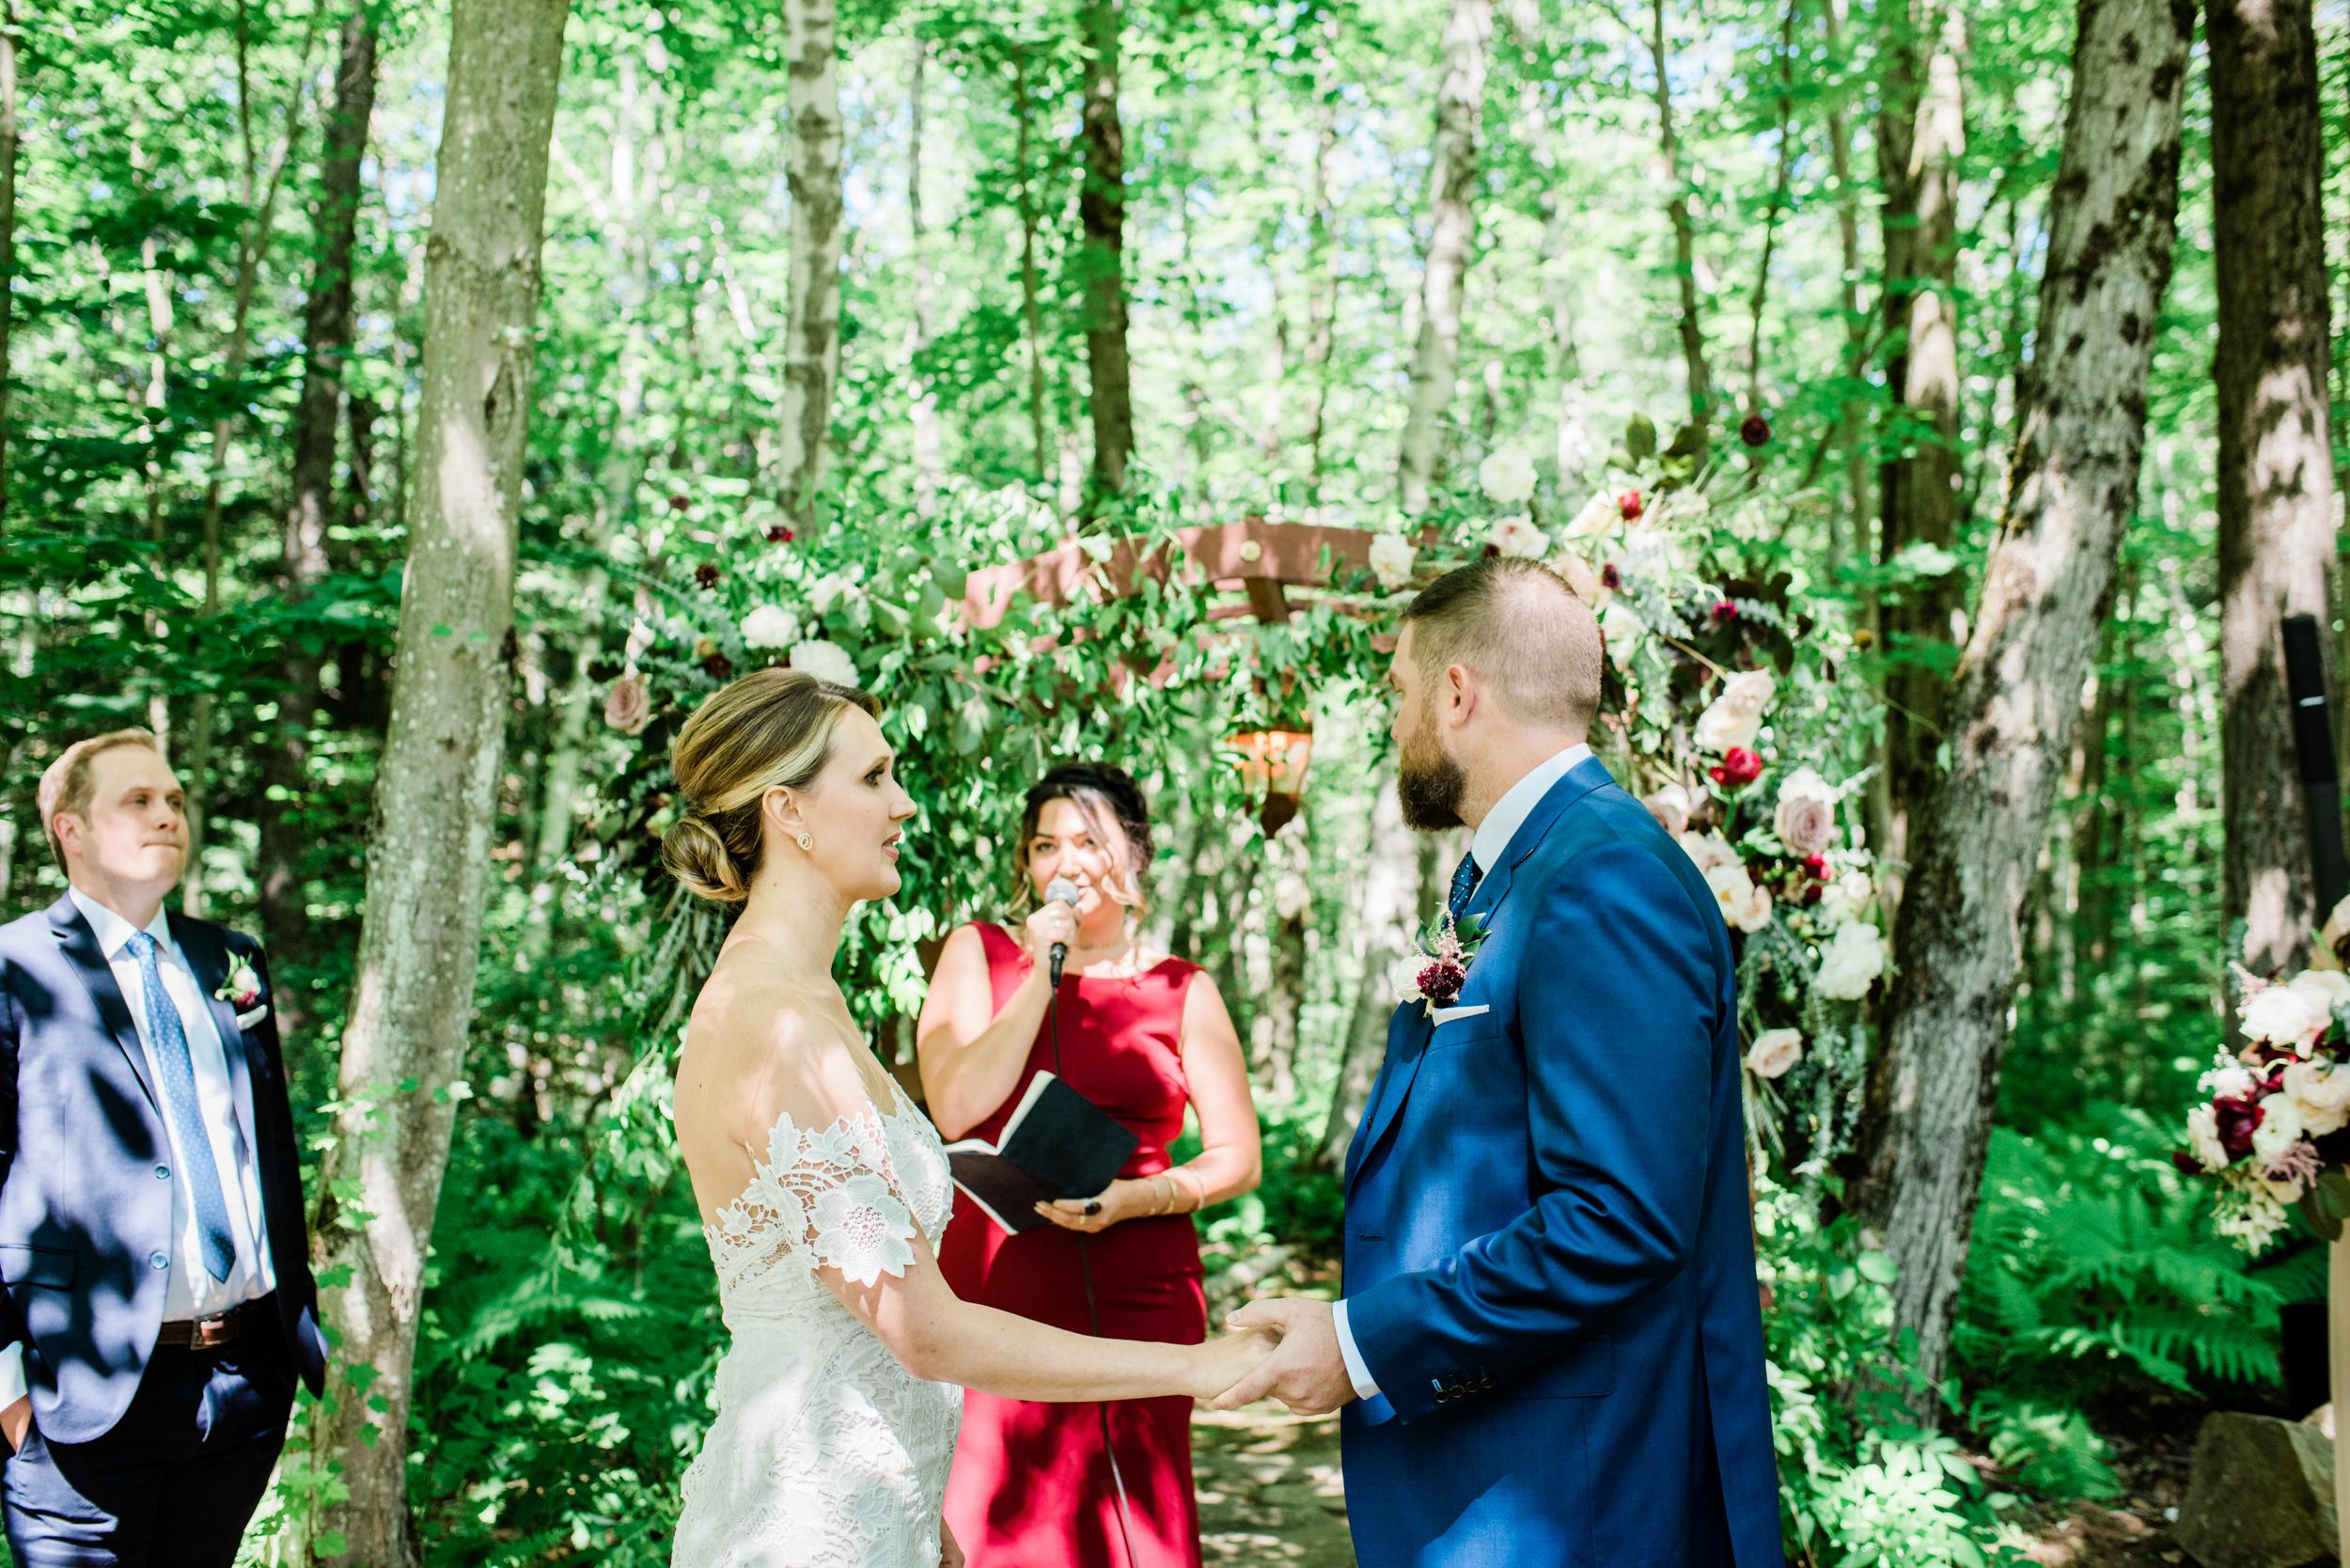 Fine art wedding photography in the Berkshires